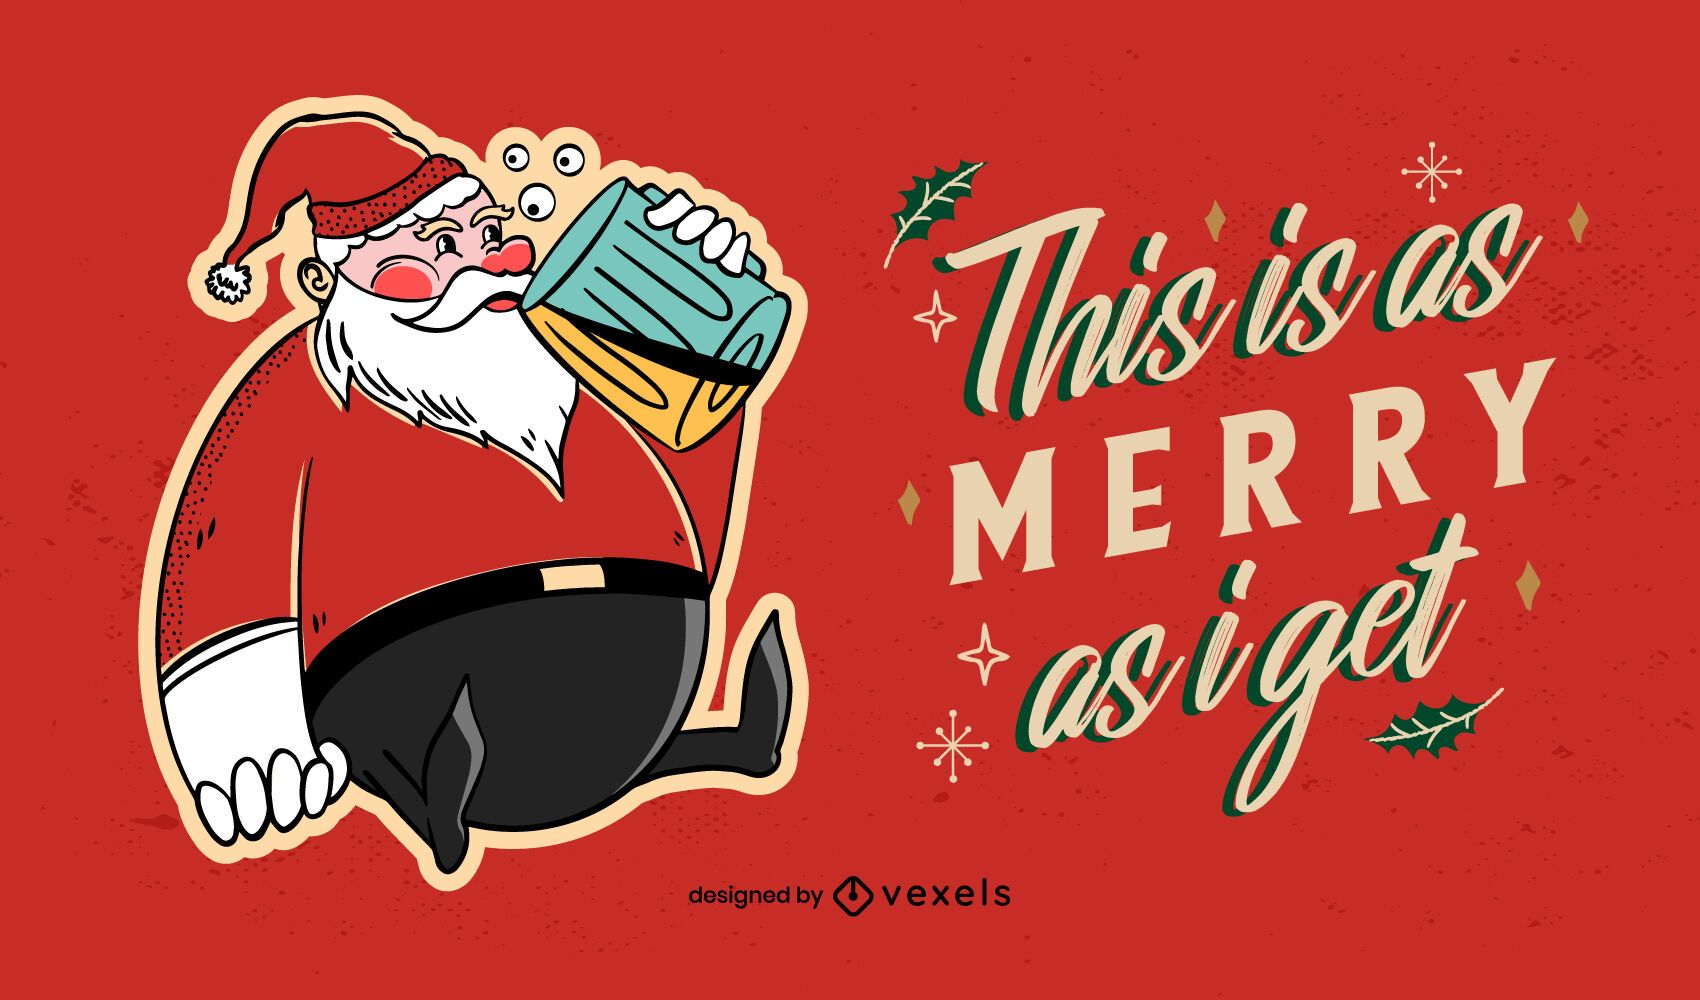 As merry as i get illustration design